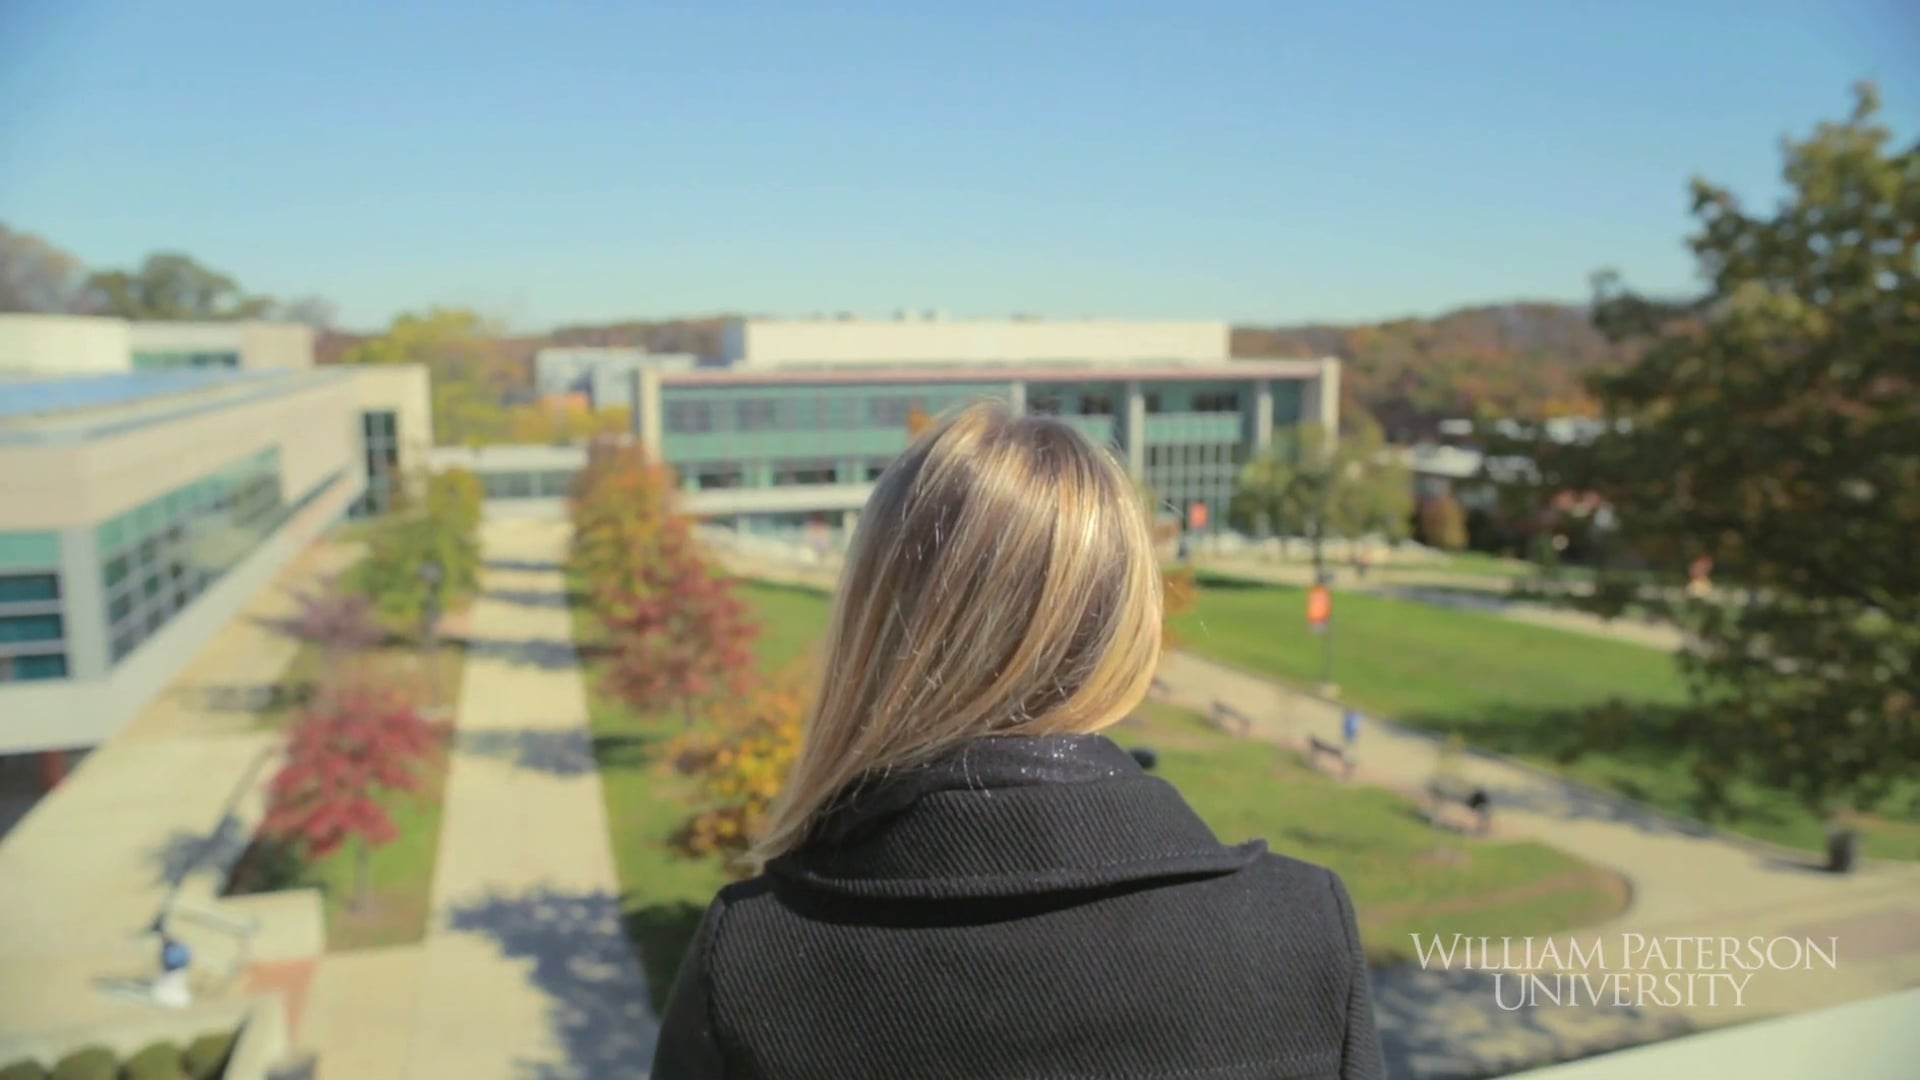 William Paterson University - Kayla  Dir Cut